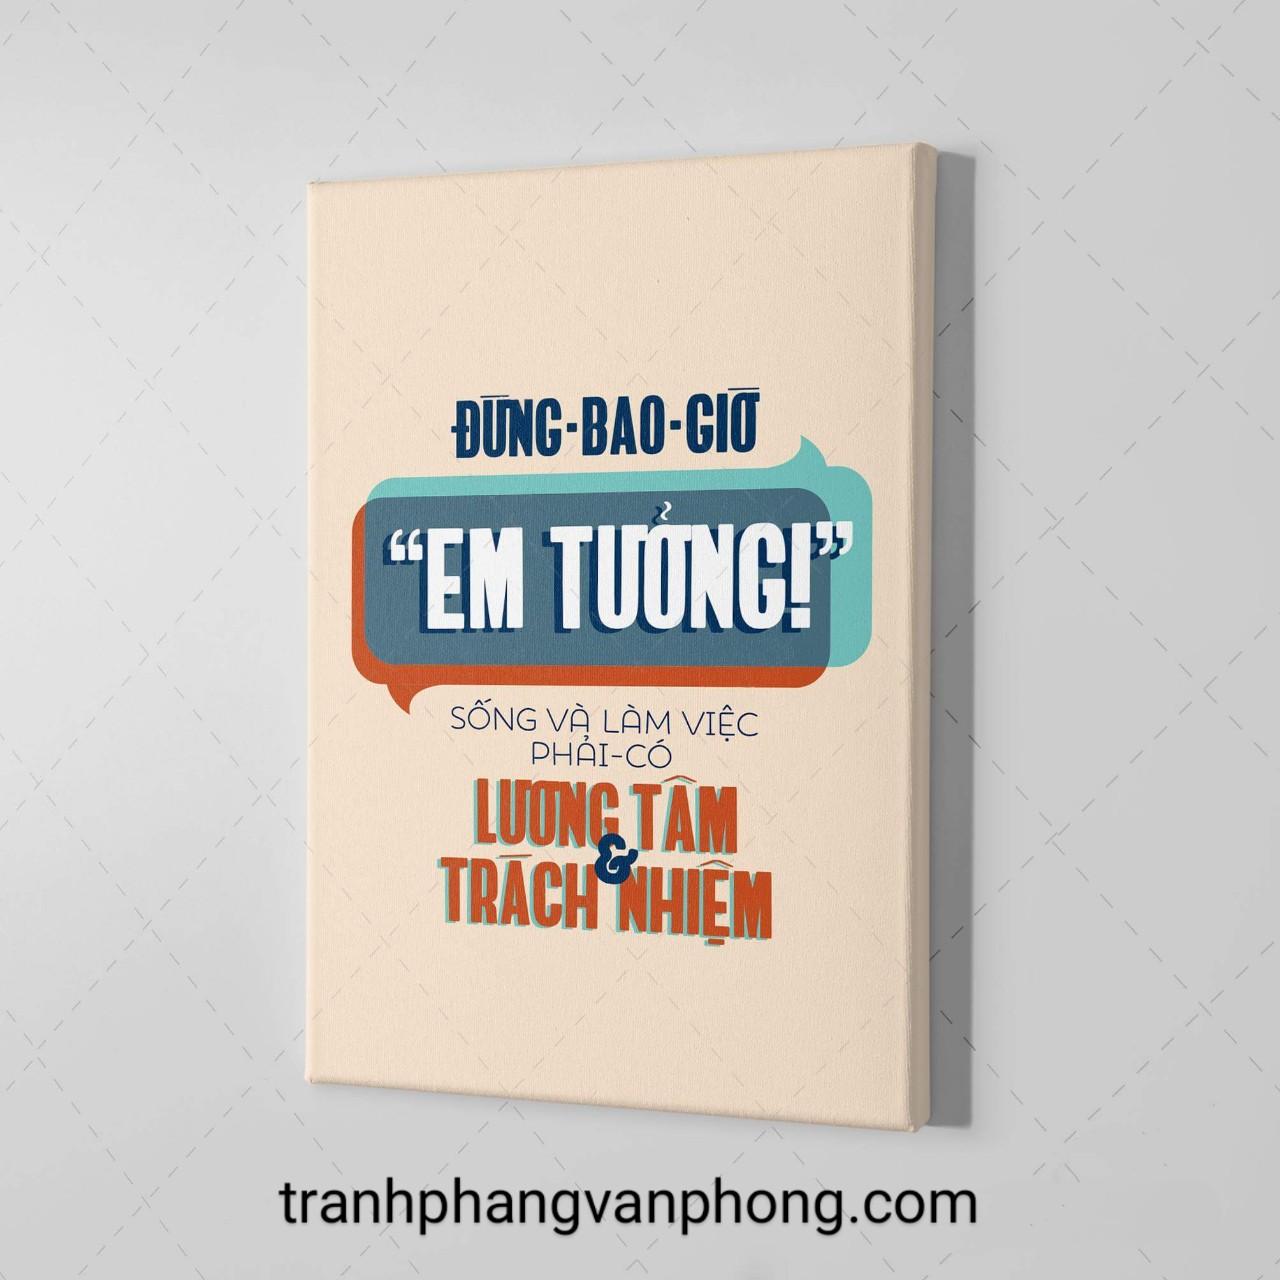 tranhphangvanphong.com